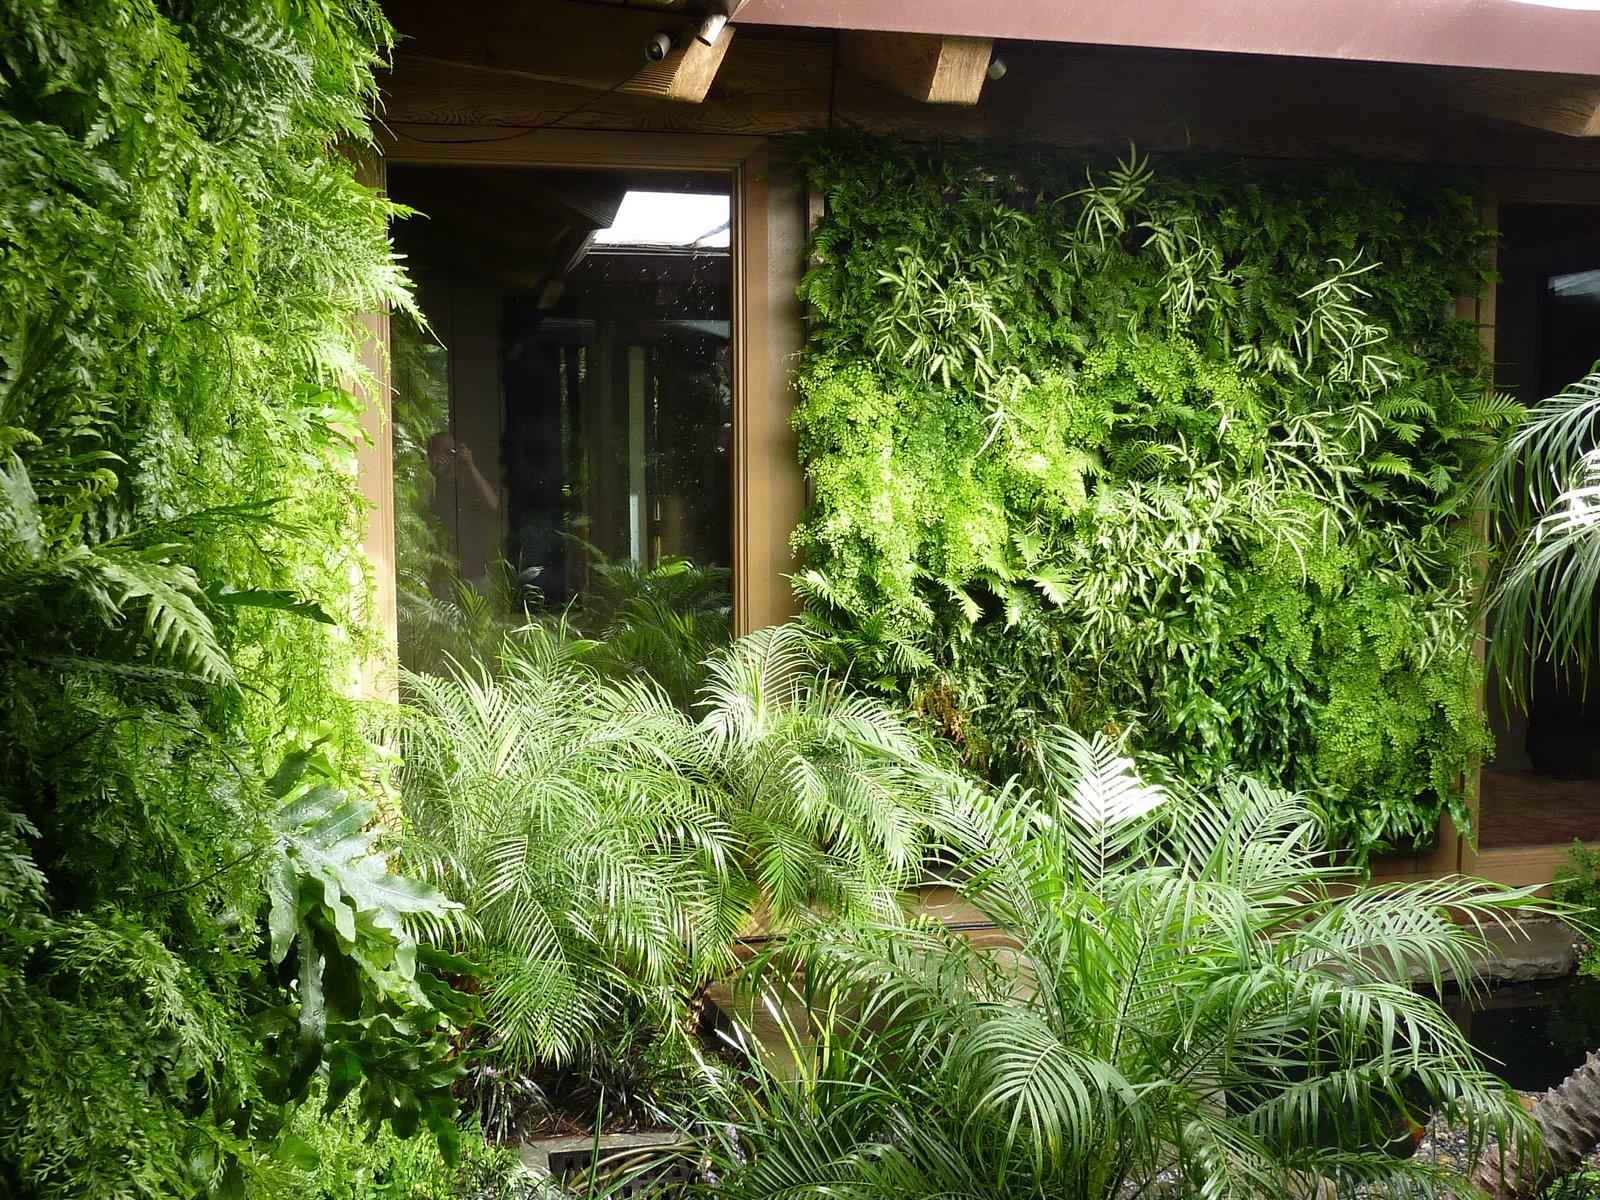 Plants On Walls Vertical Garden Systems: September 2011